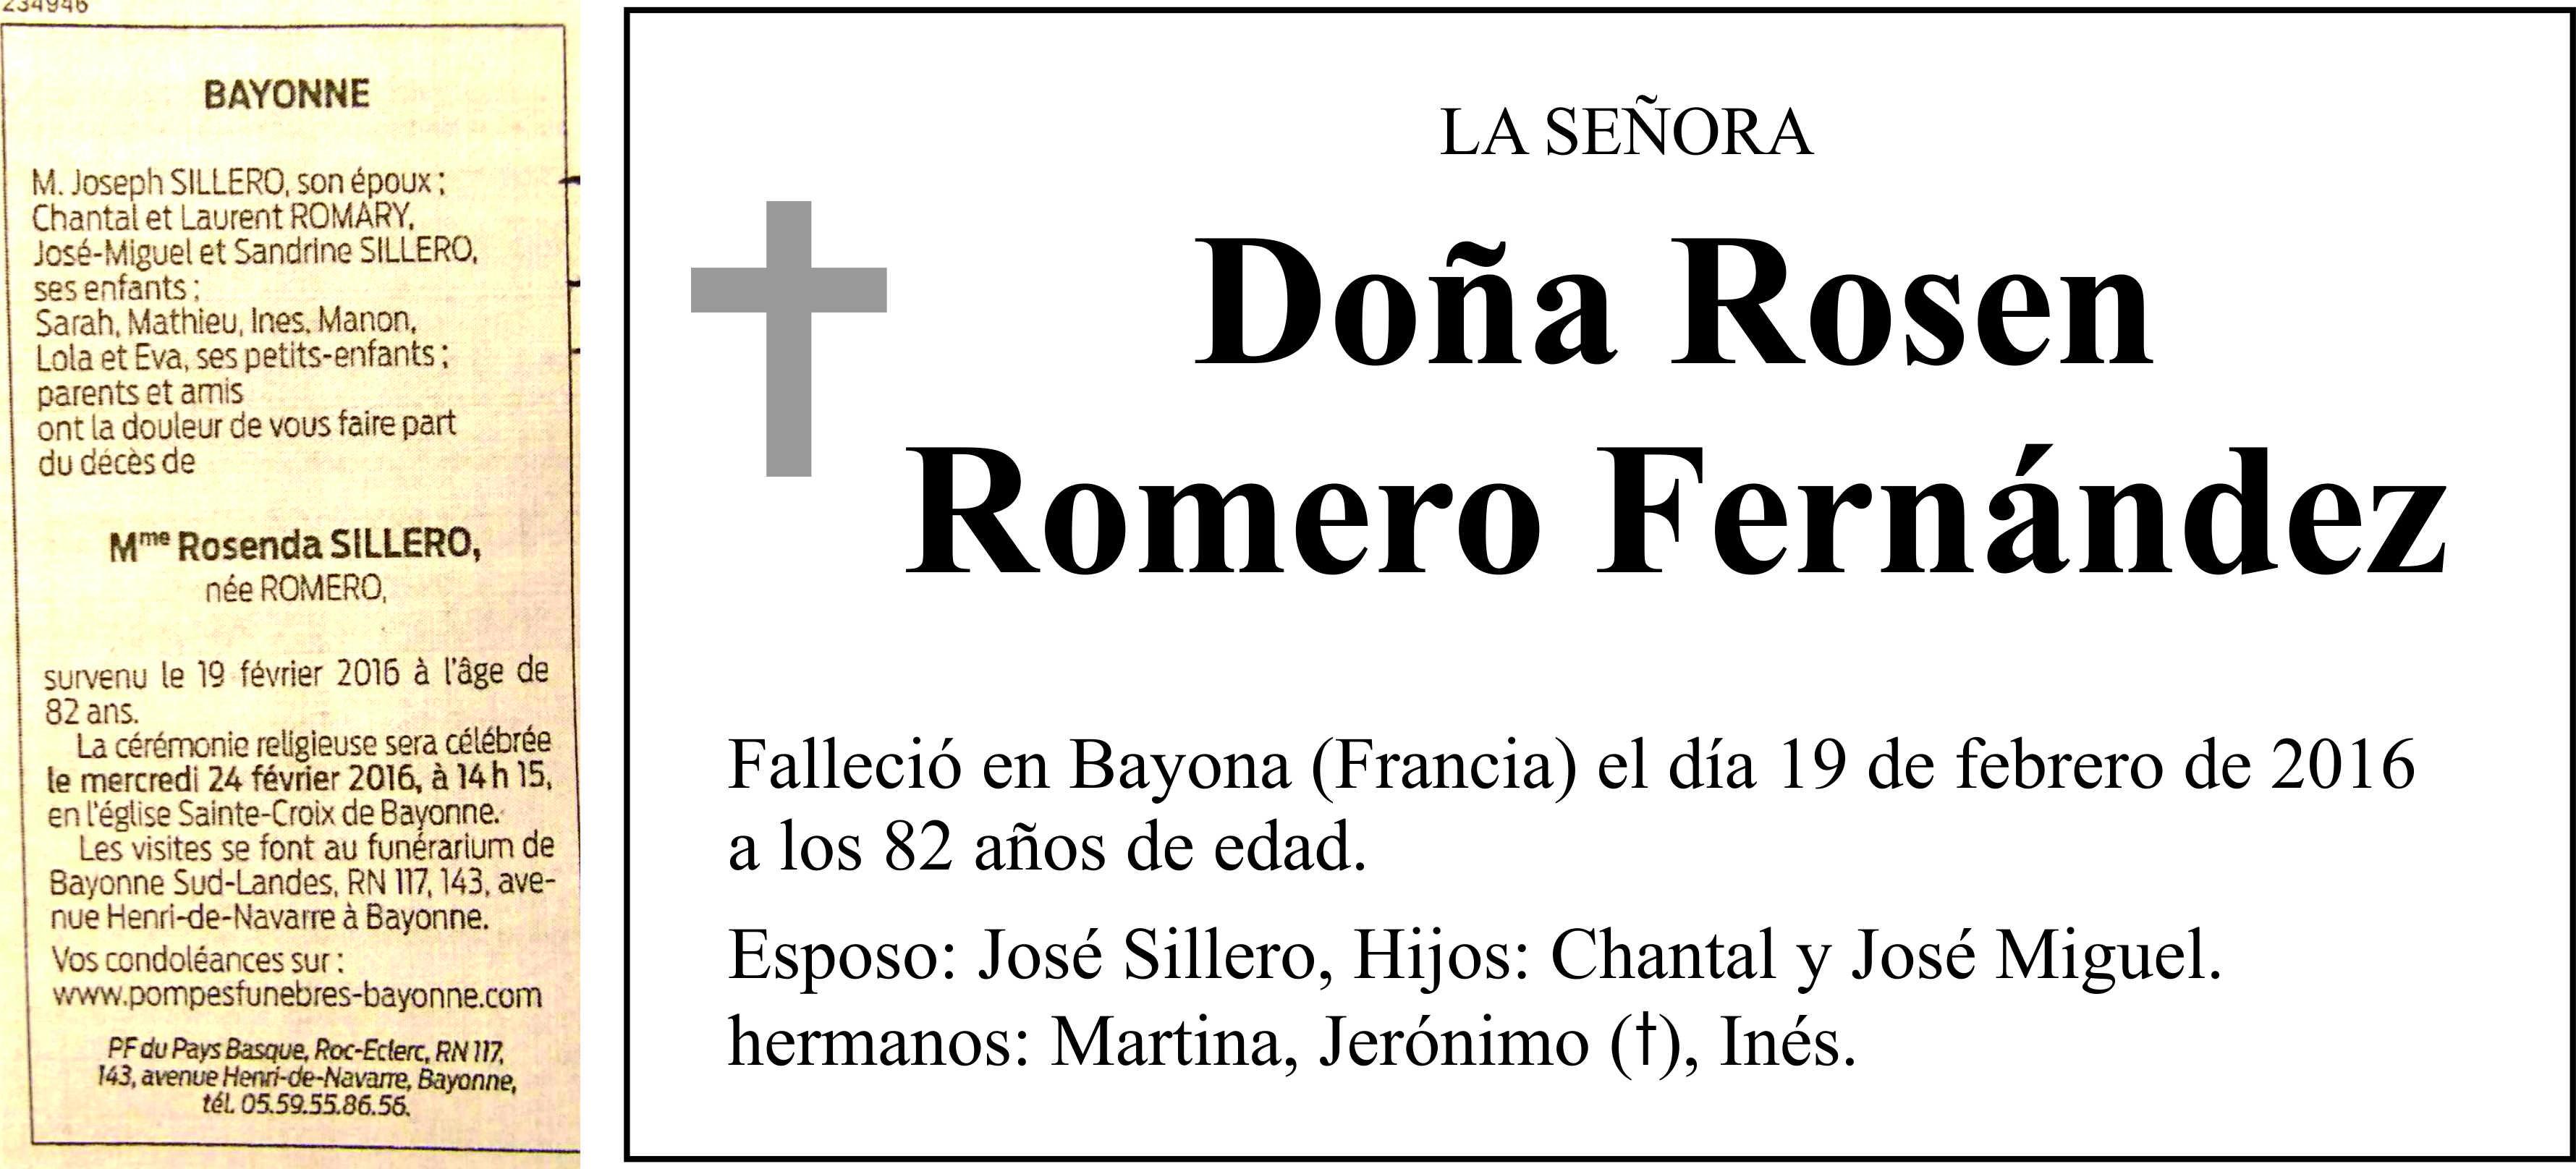 Esquela Rosen Romero, falleció el 19 de febrero de 2016, en Bayona, Francia